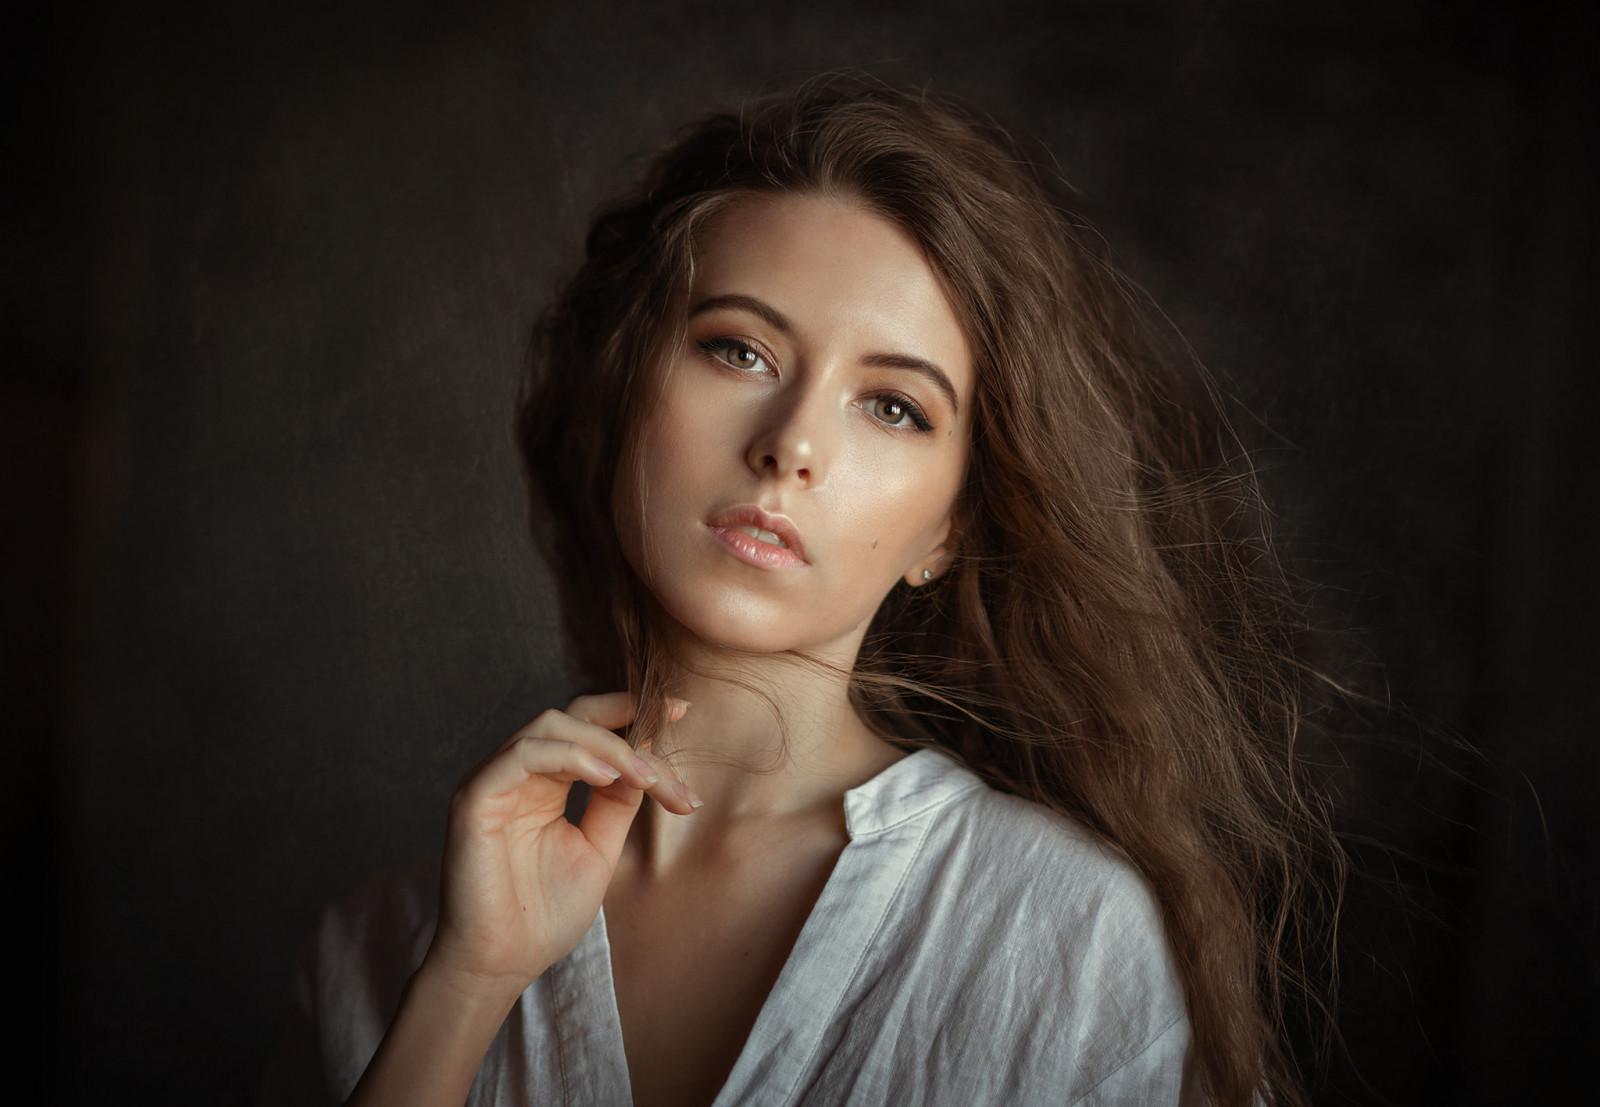 Hintergrundbilder : Frau, Modell-, Brünette, lange Haare